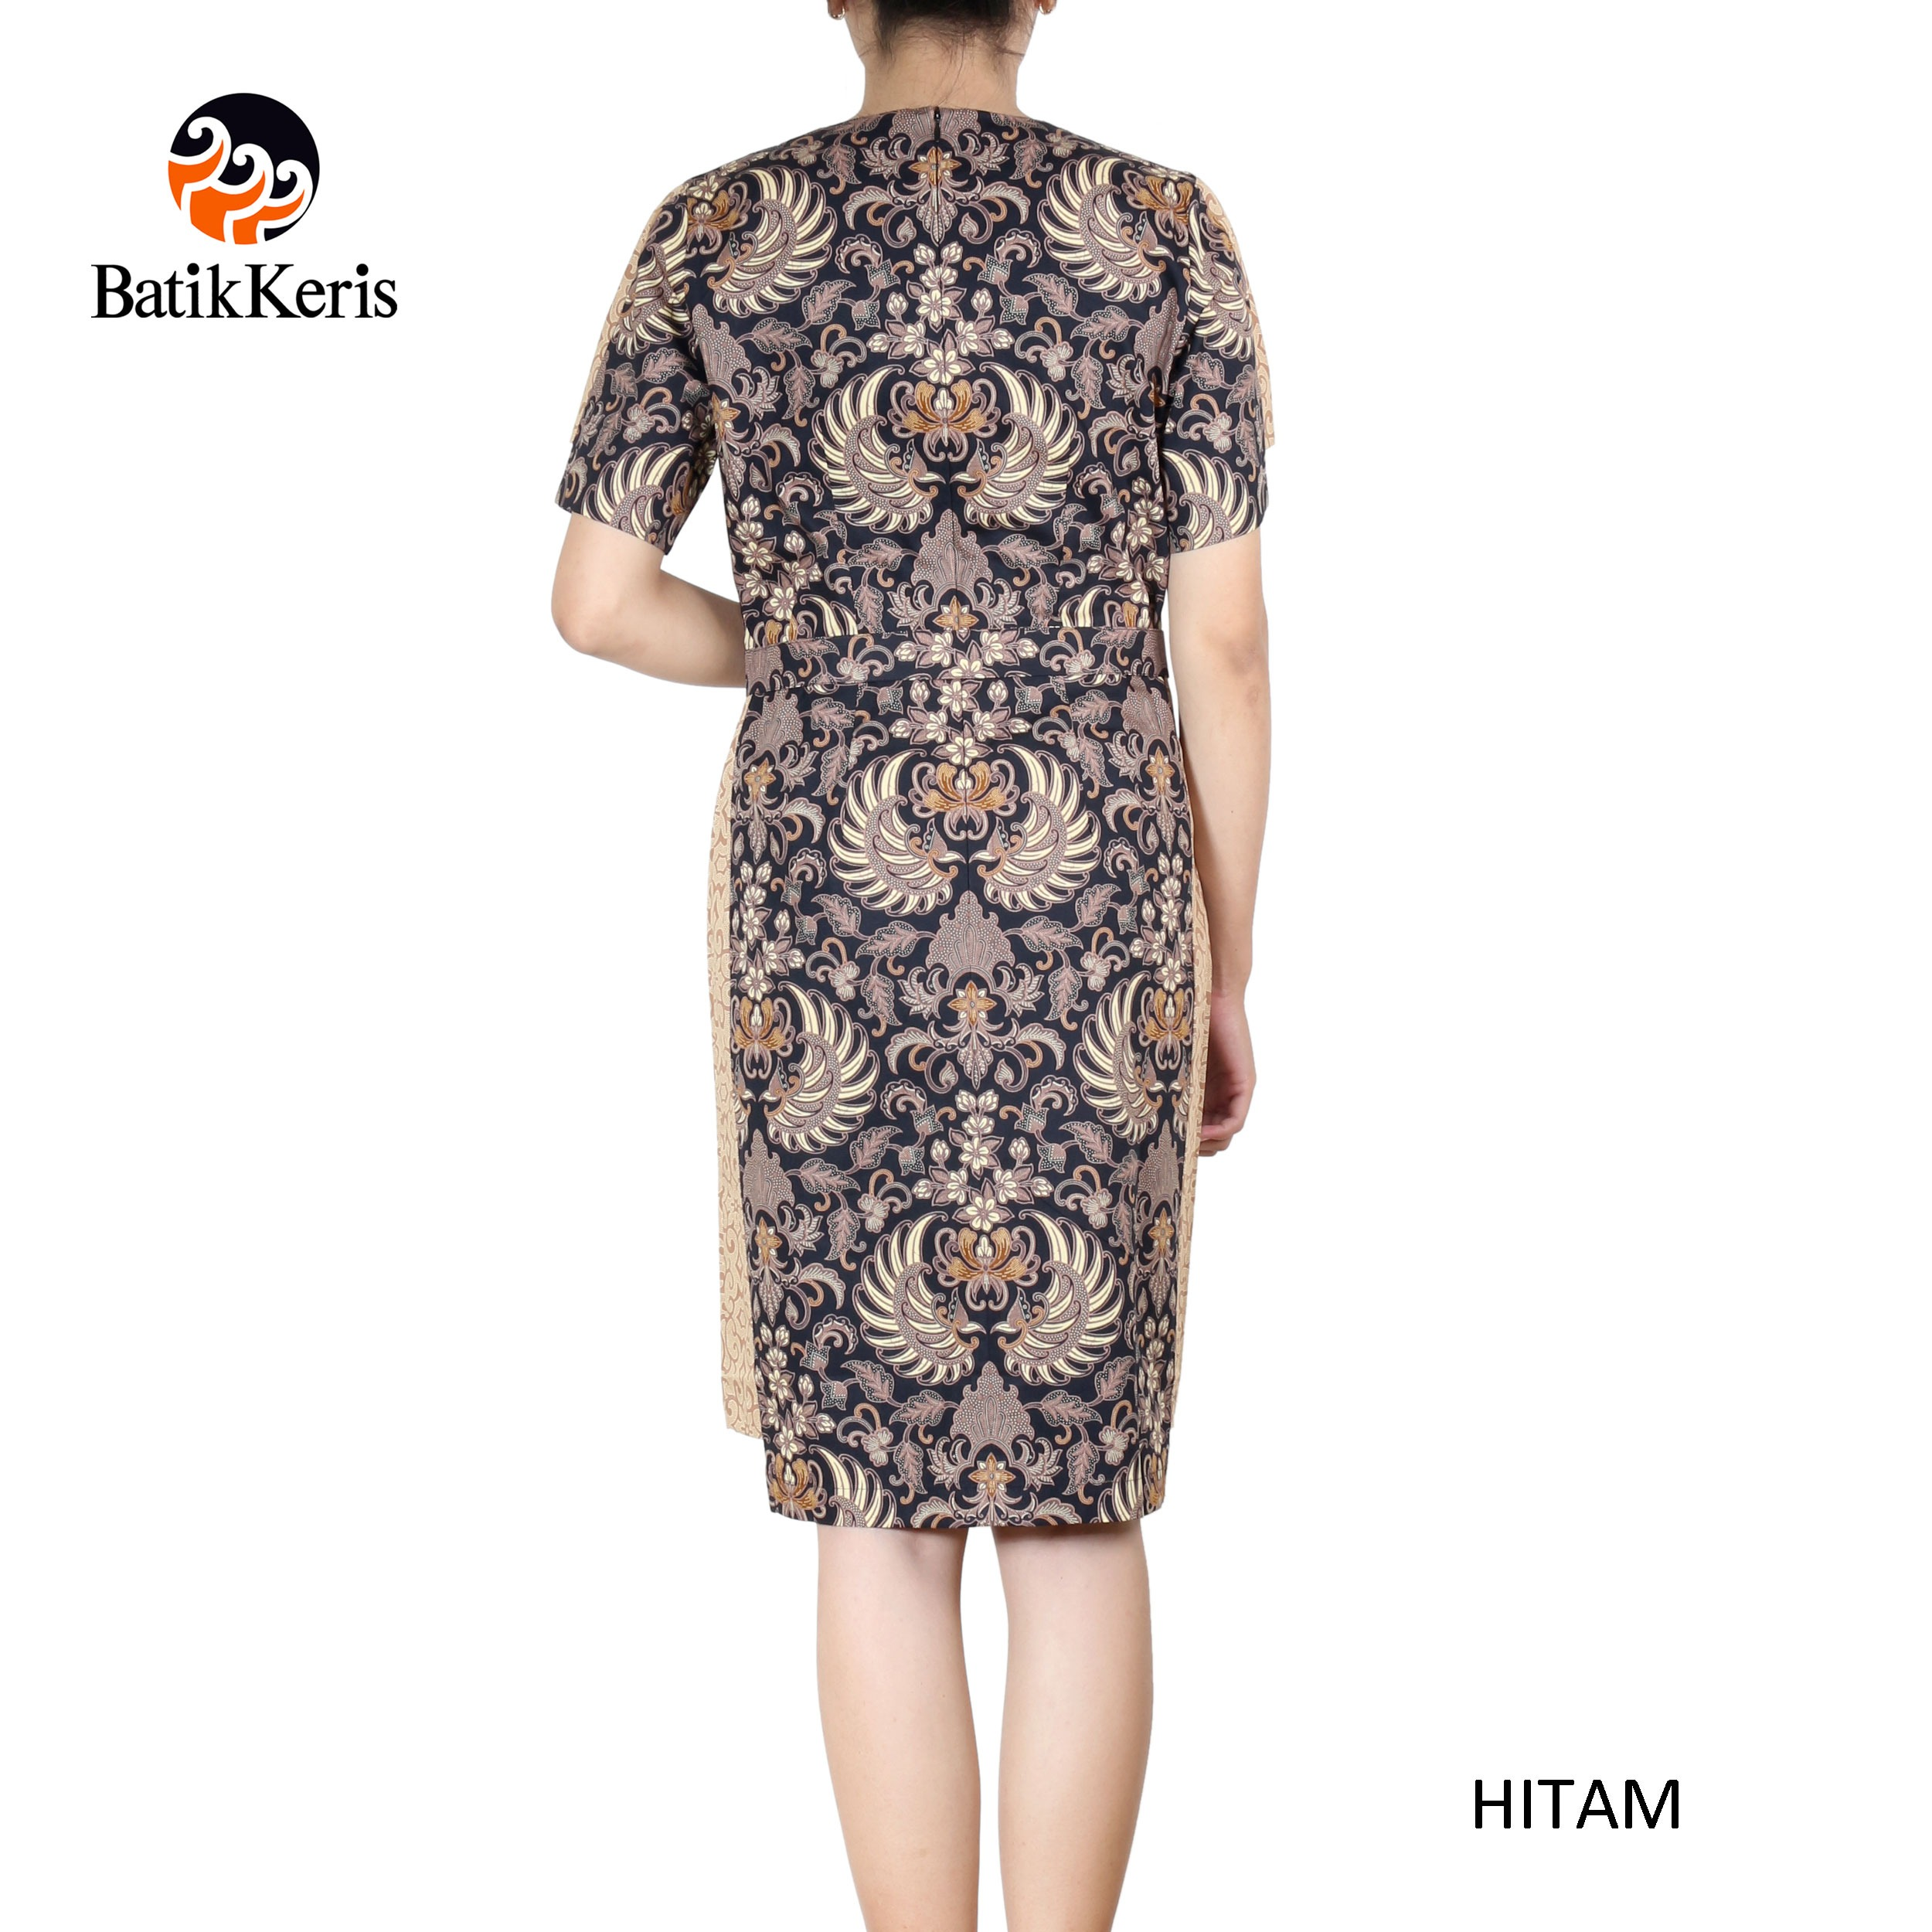 Gambar Baju Batik Wanita Koleksi Batik Keris